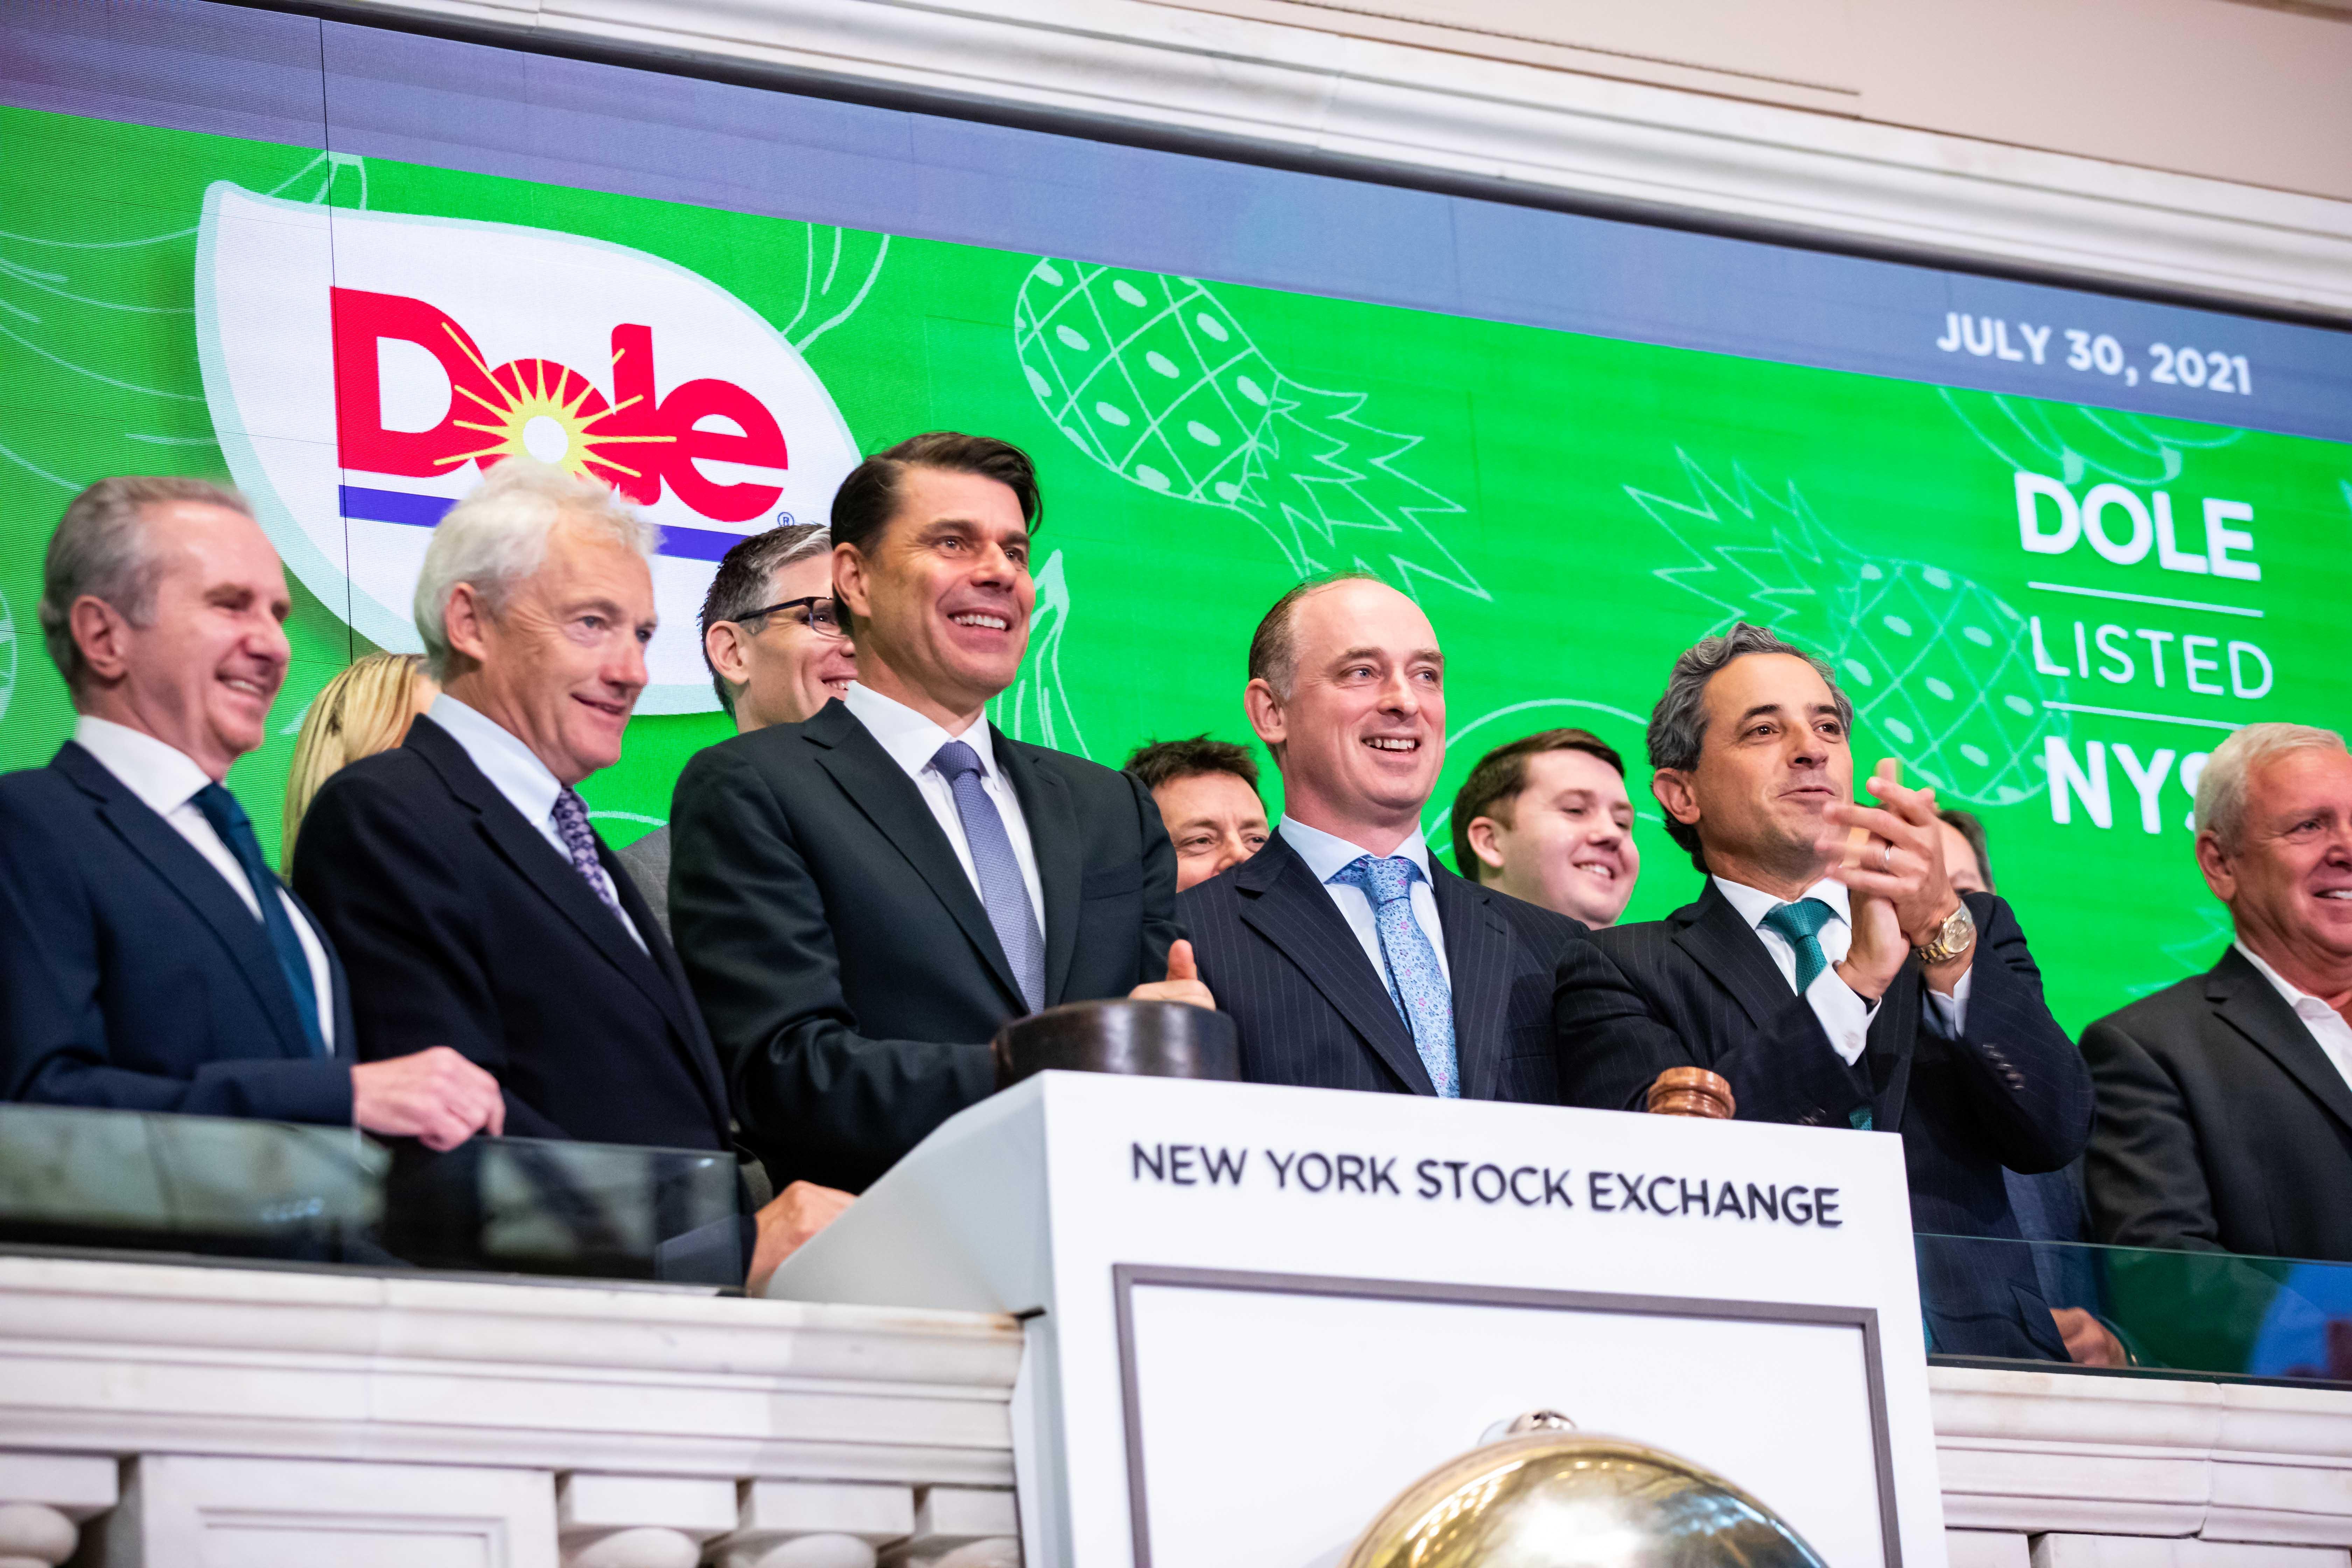 Dole stock slides 6% in public market debut on New York Stock Exchange